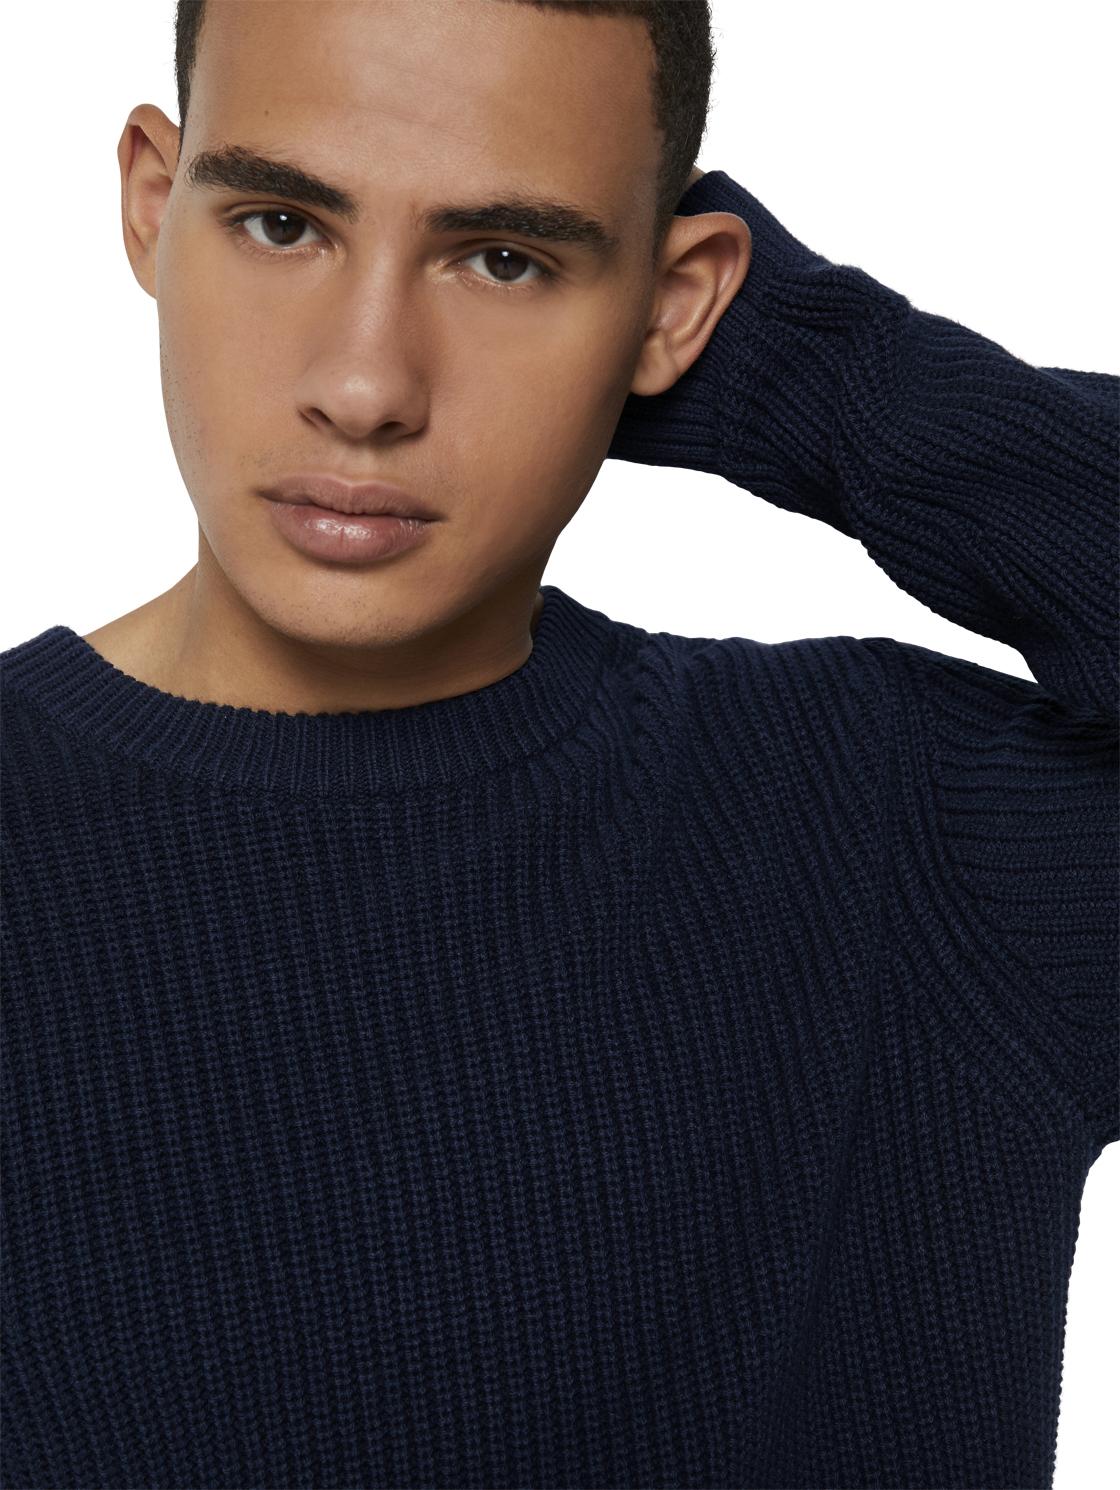 TOM TAILOR DENIM Pullover 10608147 | Sweatshirts & -Jacken ...